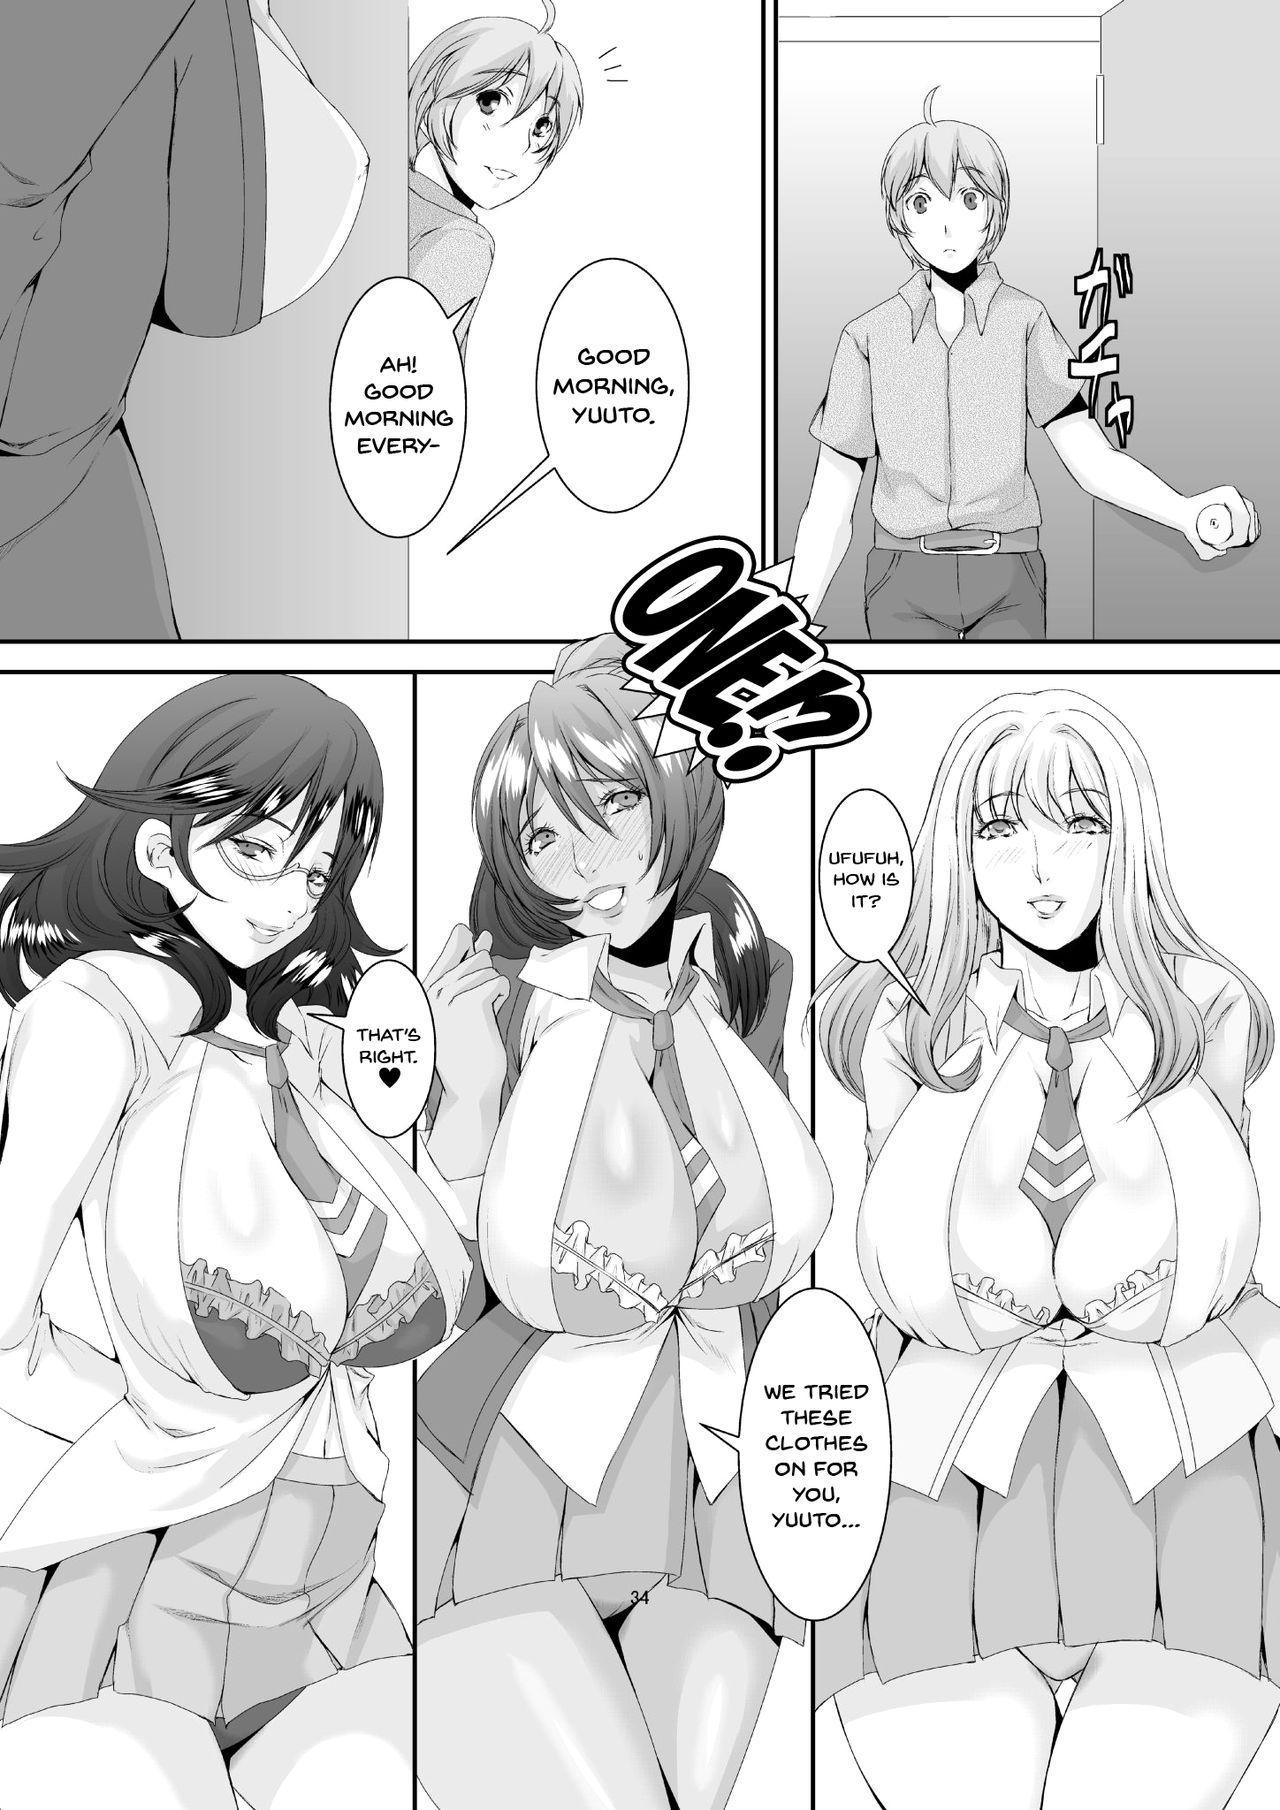 [Sprechchor (Eguchi Chibi)] Oku-sama wa Moto Yariman -Besluted- 2   These Women Were Former Sluts -Besluted- 2 [English] [Doujins.com] [Digital] 34